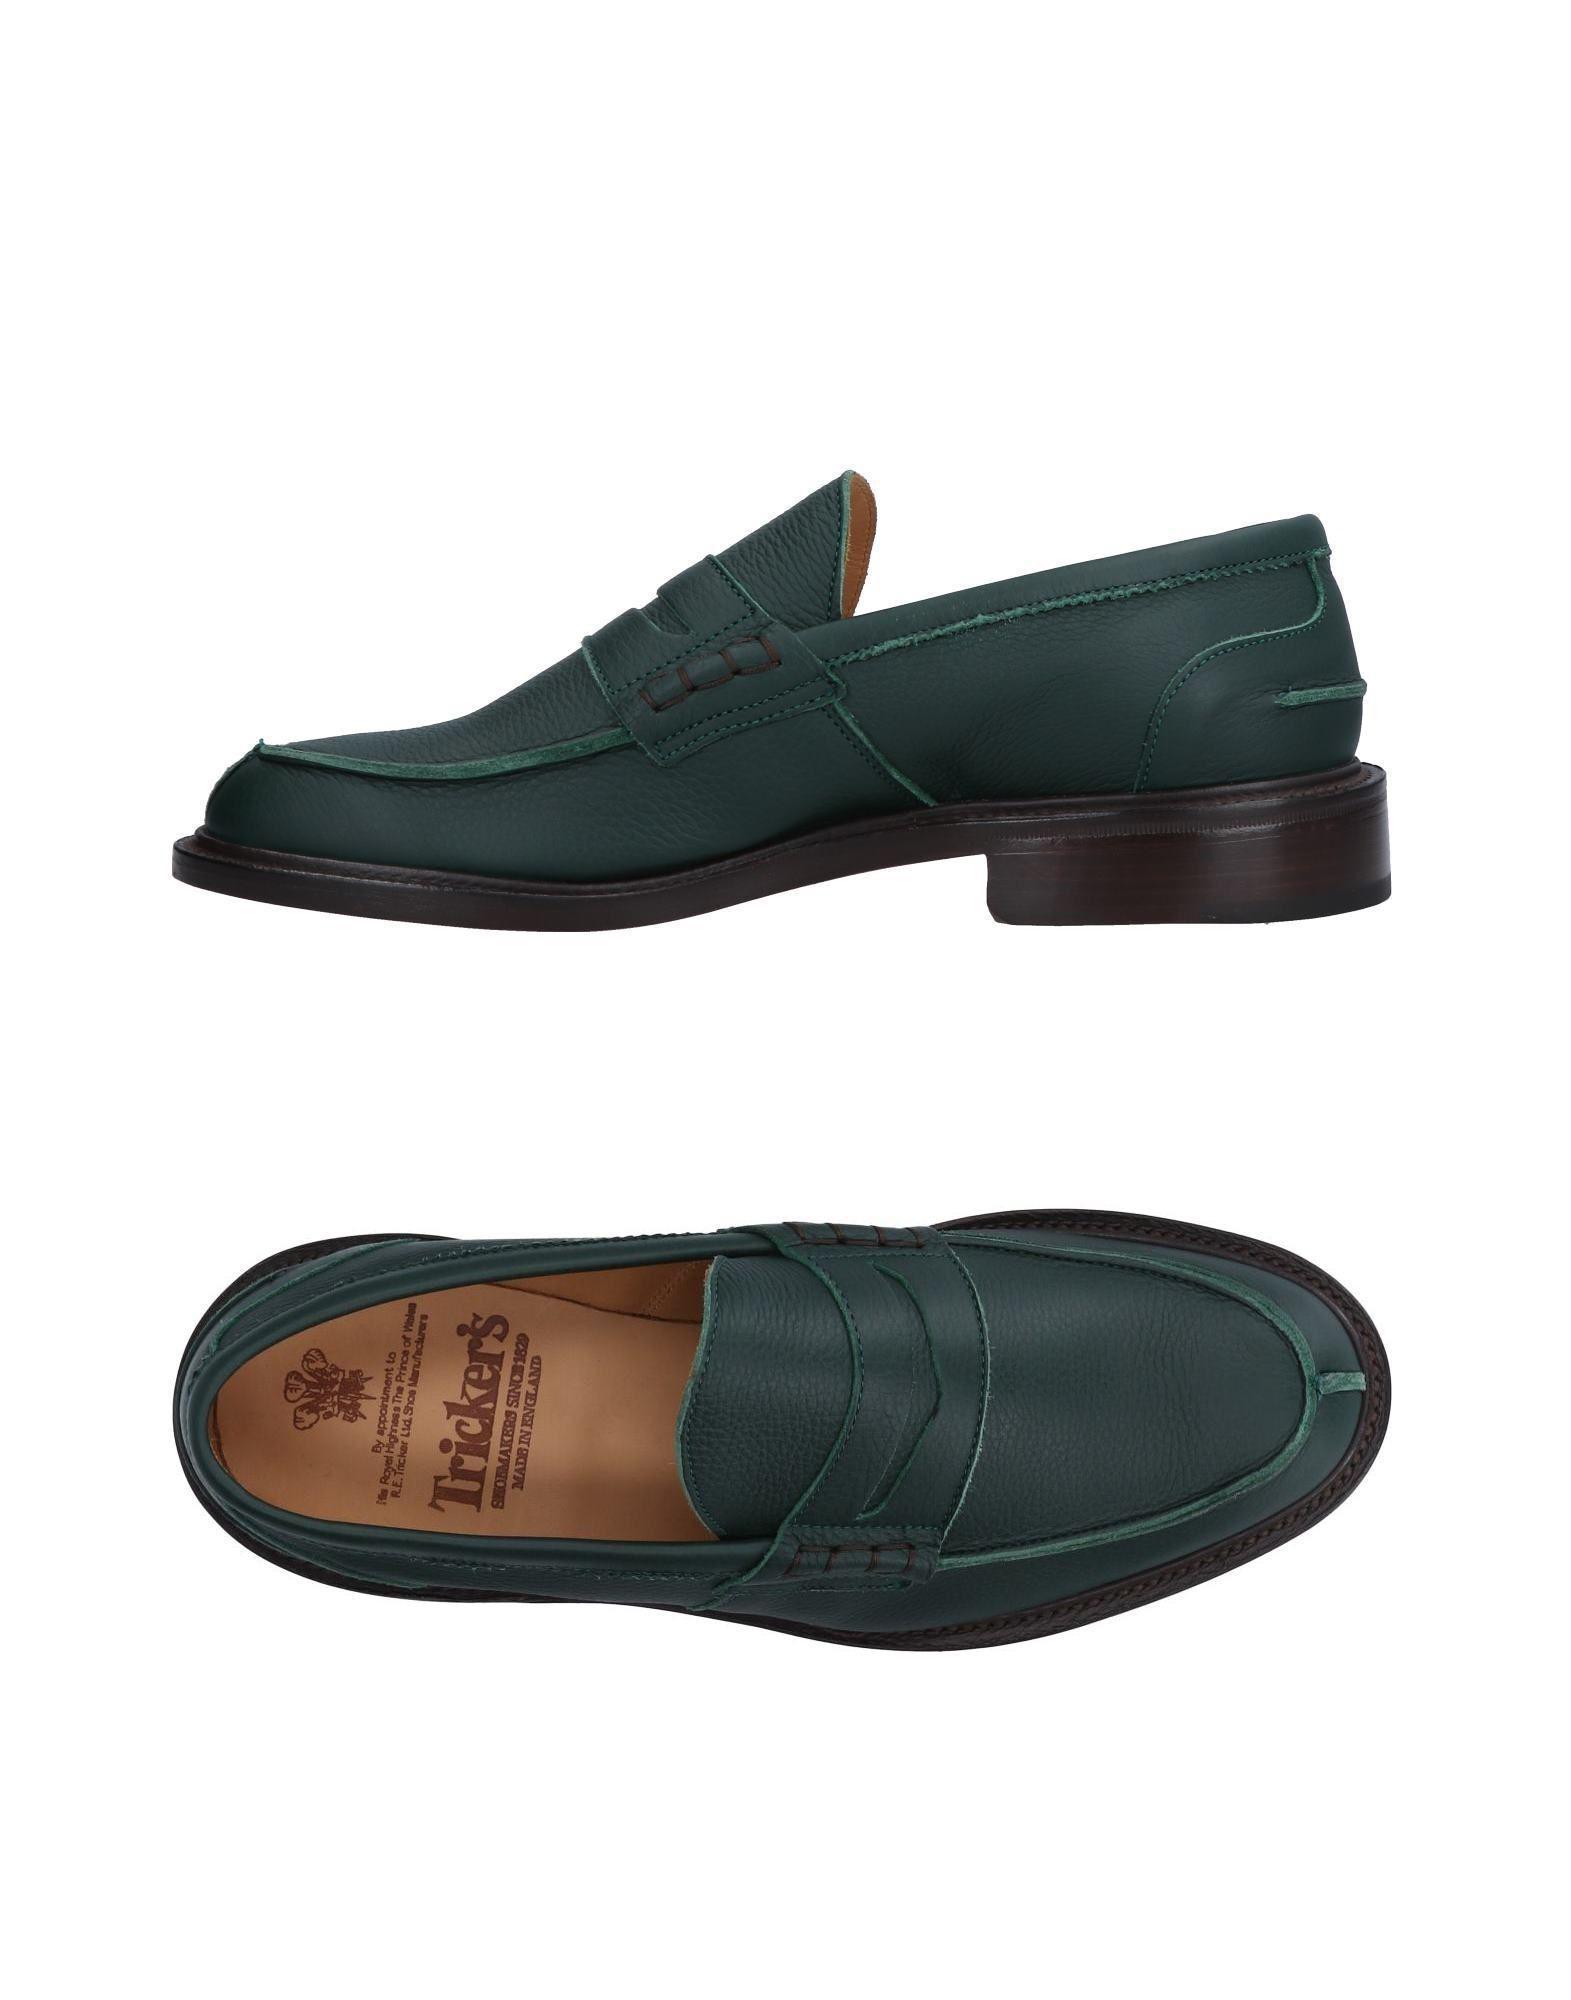 aa22900f5d60bb Tricker's - Green Loafer for Men - Lyst. View fullscreen